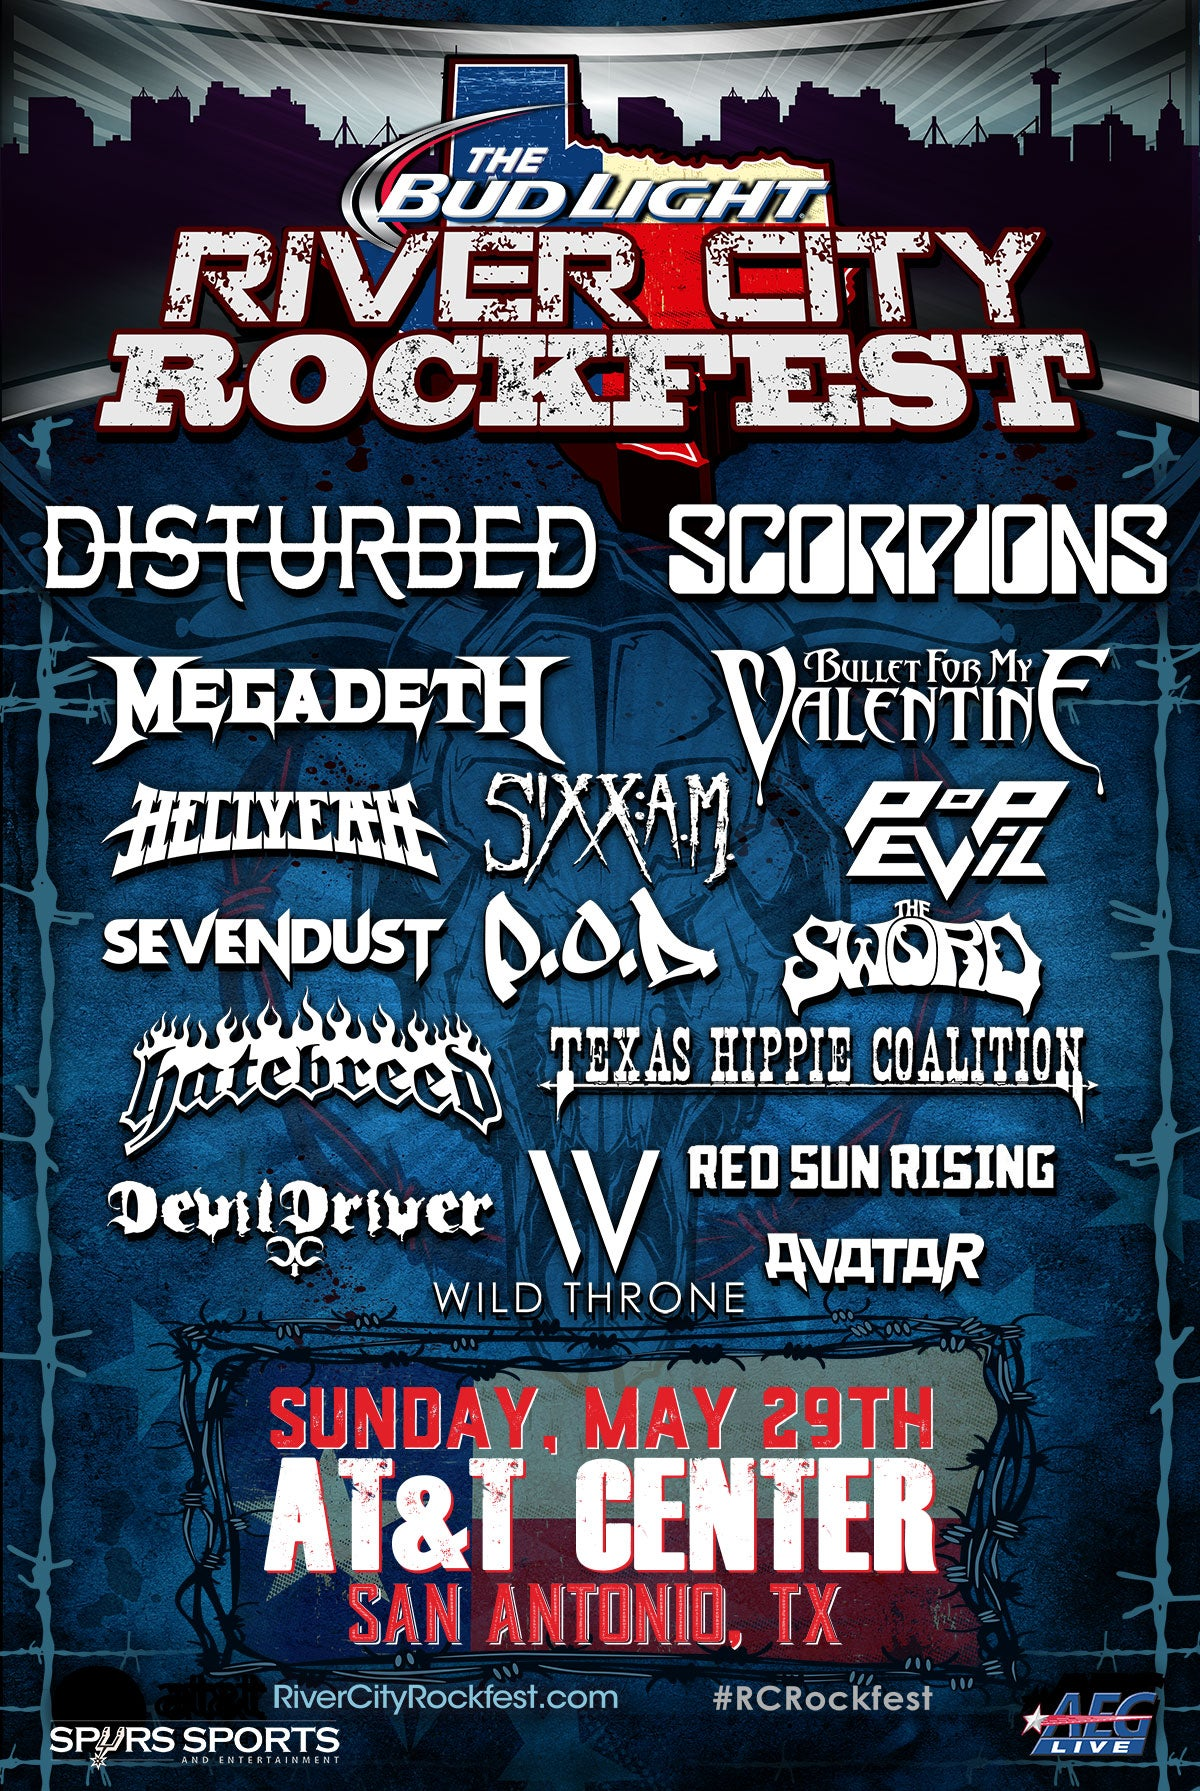 2016 River City Rockfest Lineup.jpg